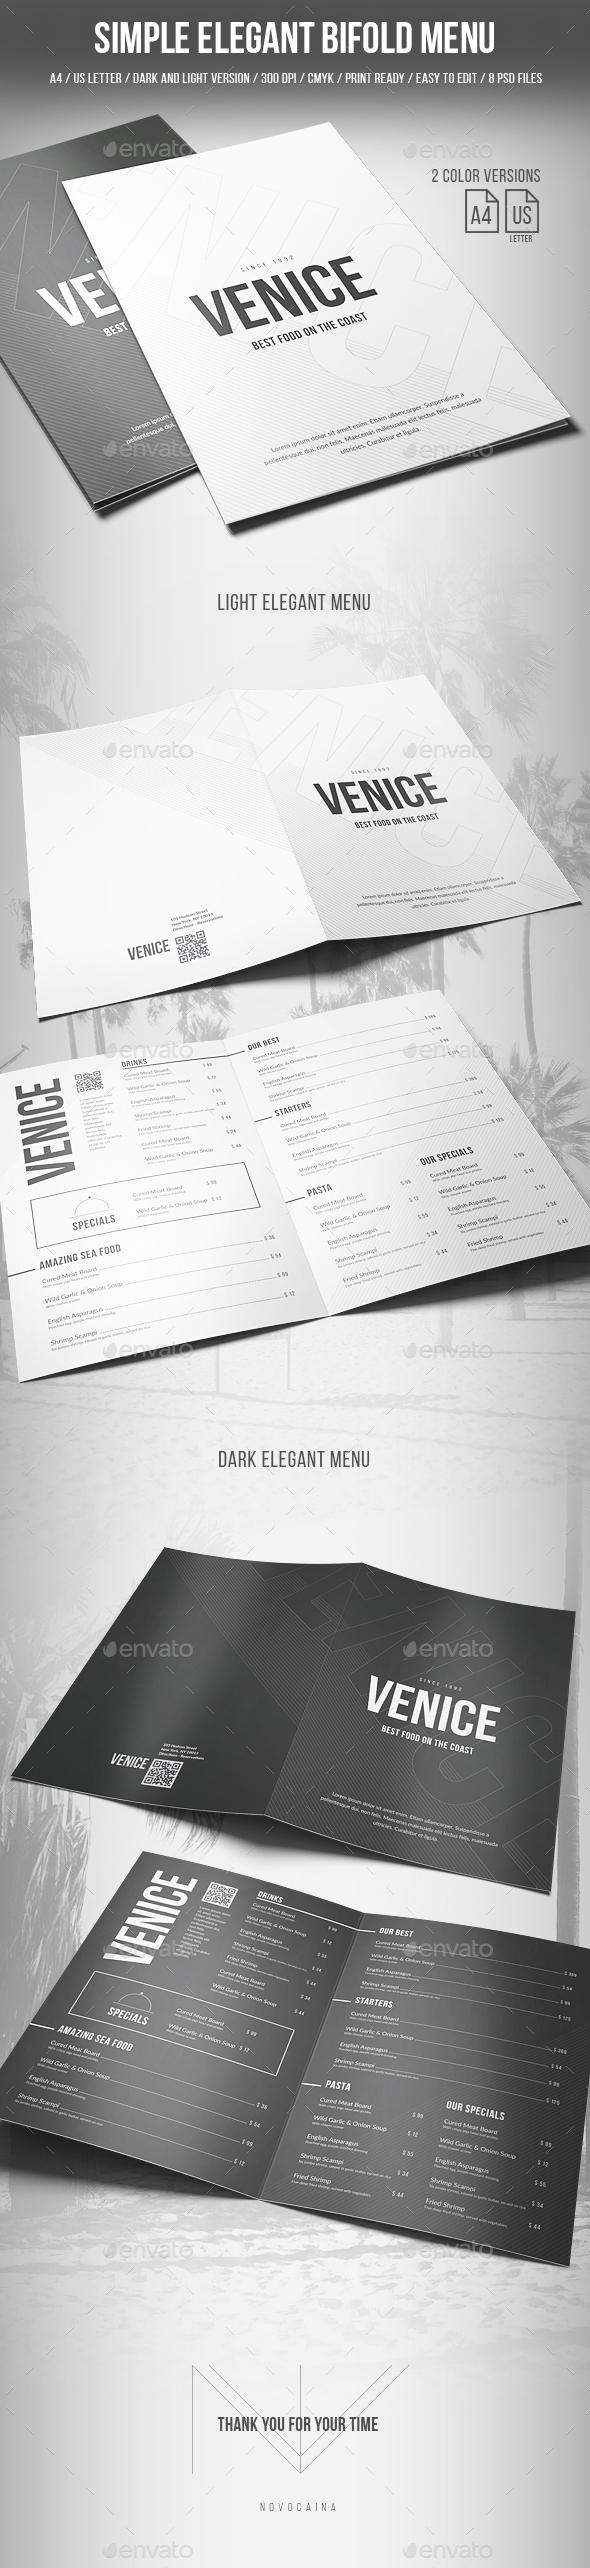 Simple Elegant Bifold Menu - A4 and US Letter - 2 Color Version - Food Menus Print Templates